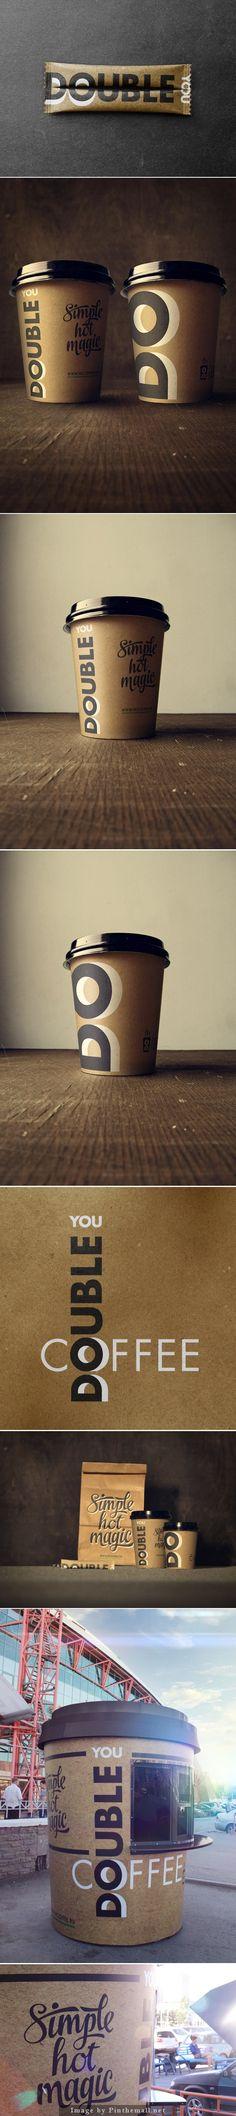 DOUBLE U COFFEE